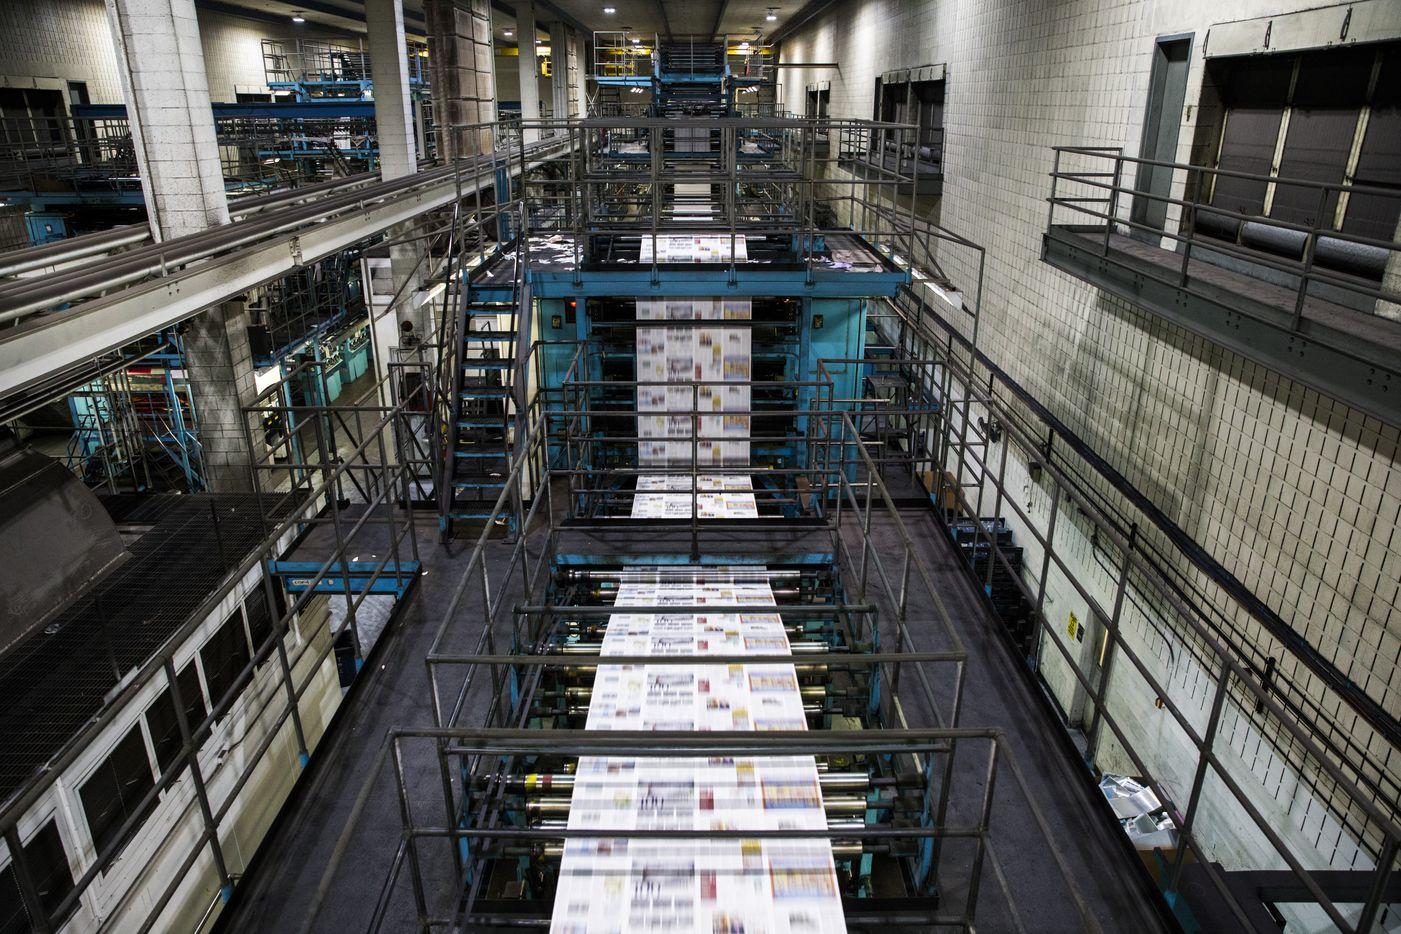 Printing presses roll. (Ashley Landis/The Dallas Morning News)